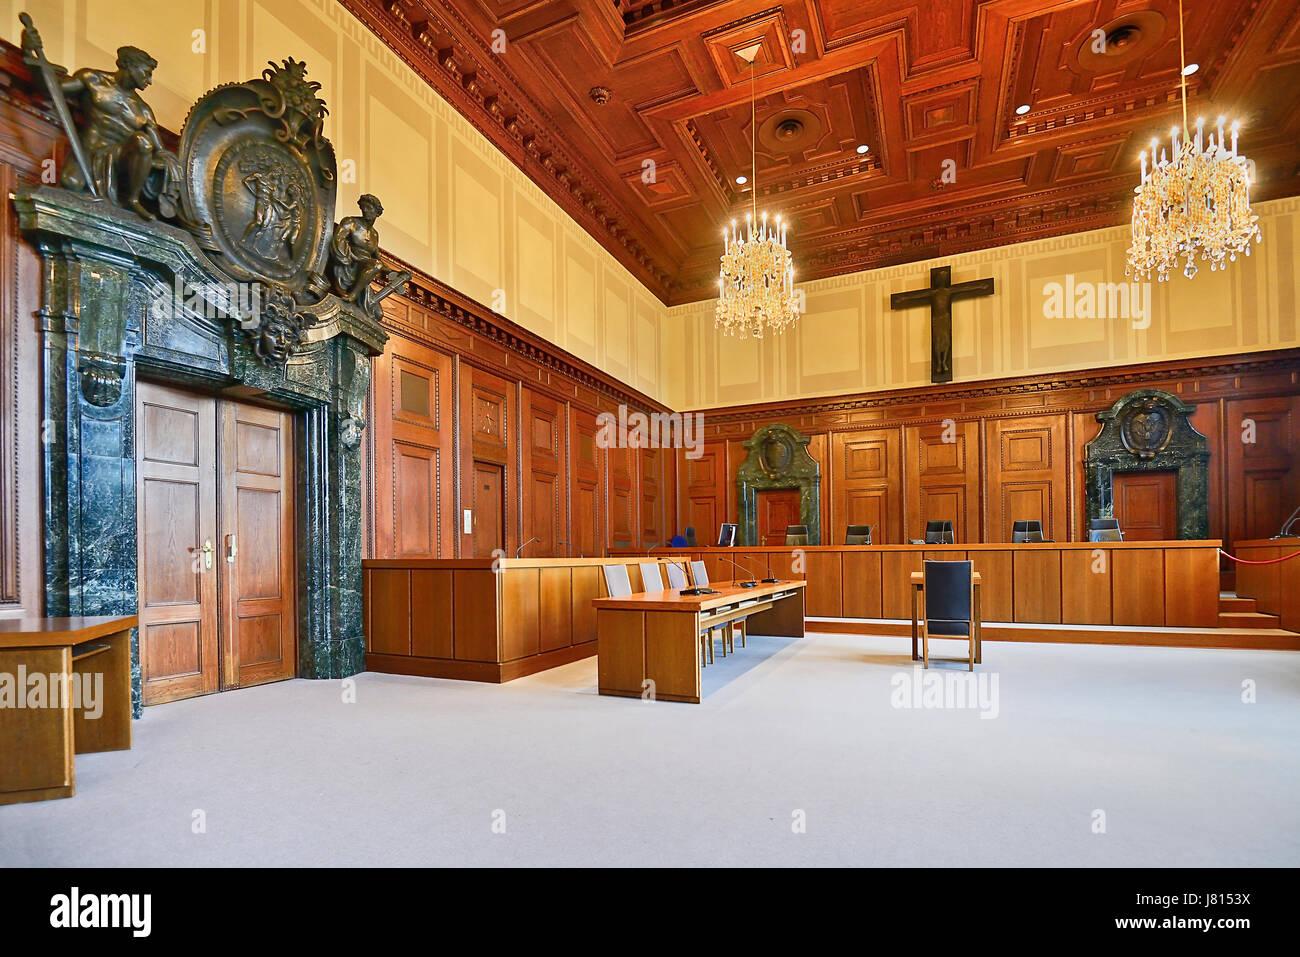 Germany, Bavaria, Nuremberg, Nuremberg Palace of Justice, Memorium Nuremberg Trials Museum, Courtroom 600. - Stock Image